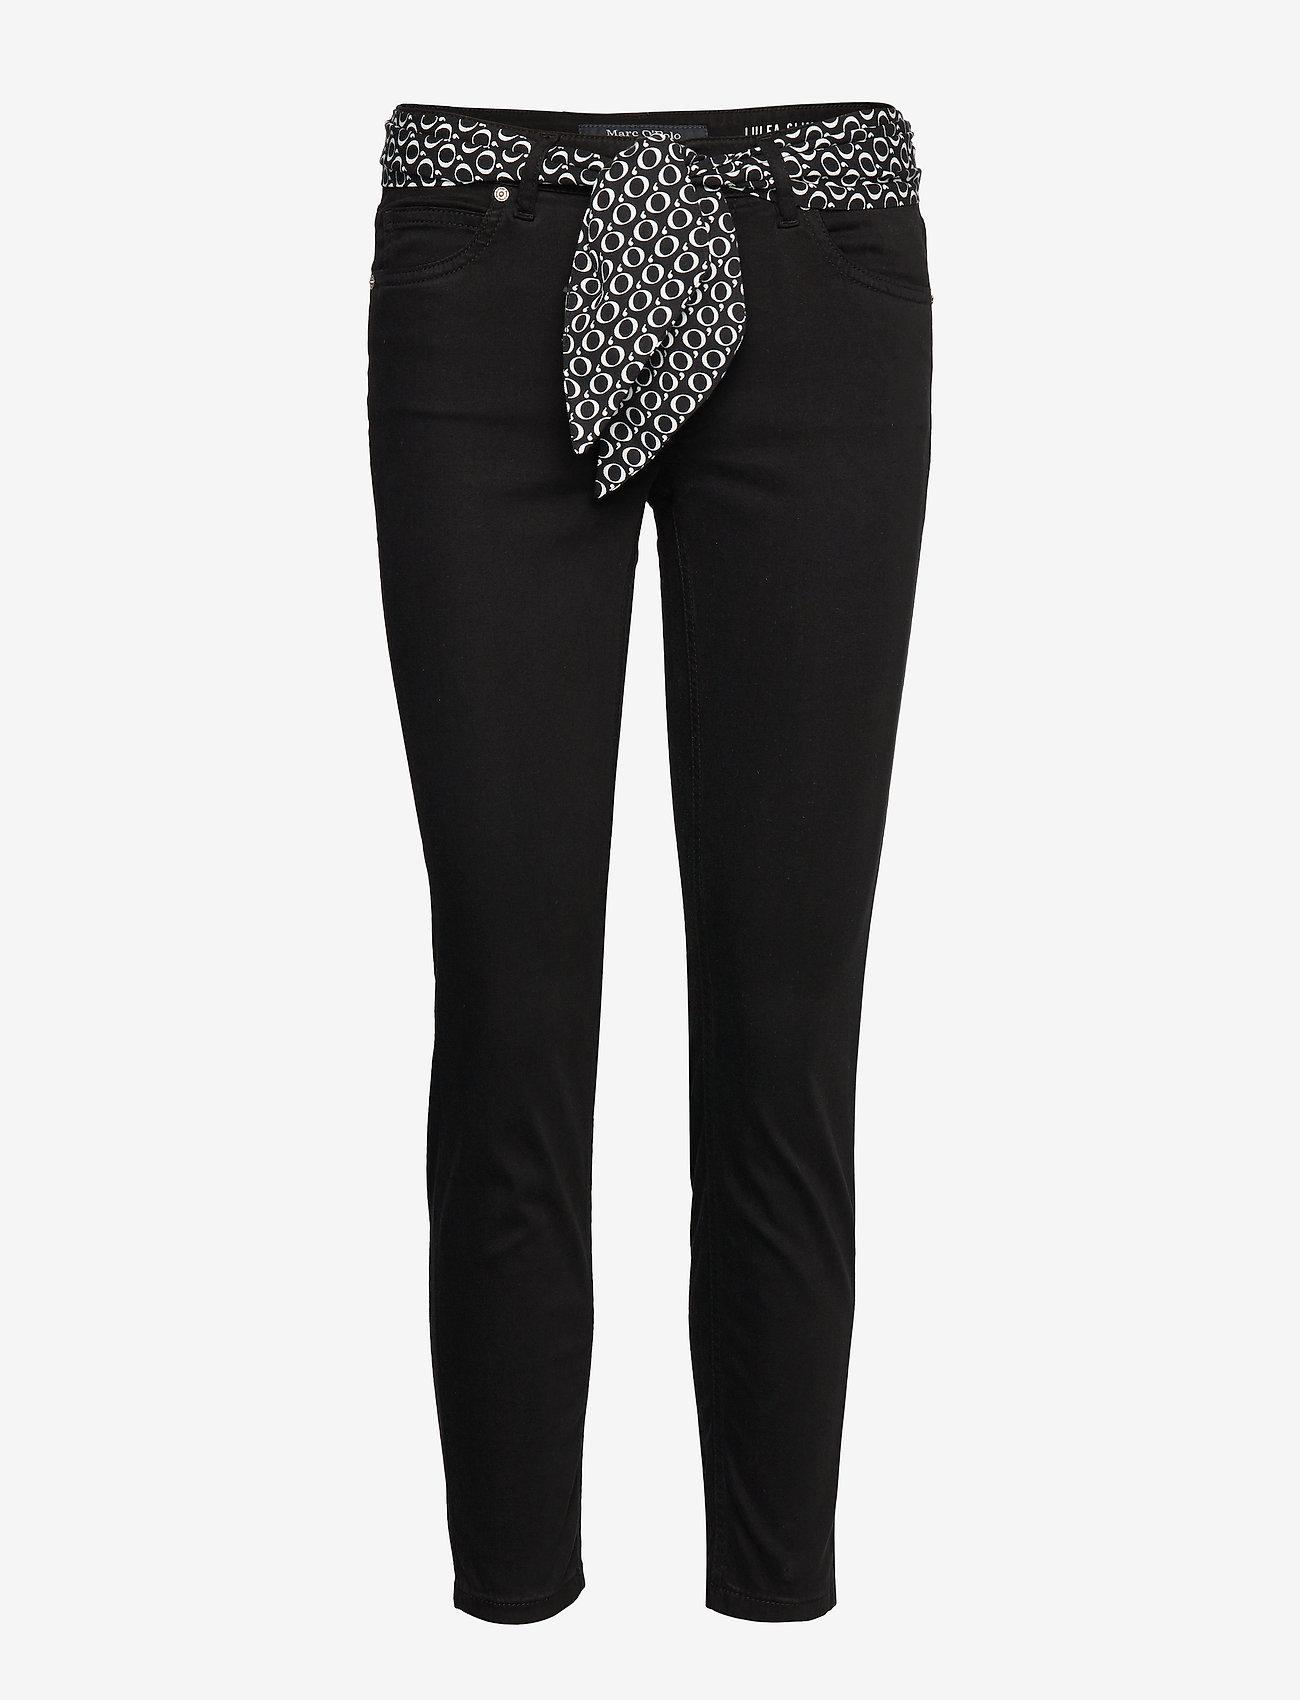 Marc O'Polo - Jeans - slim jeans - black - 0